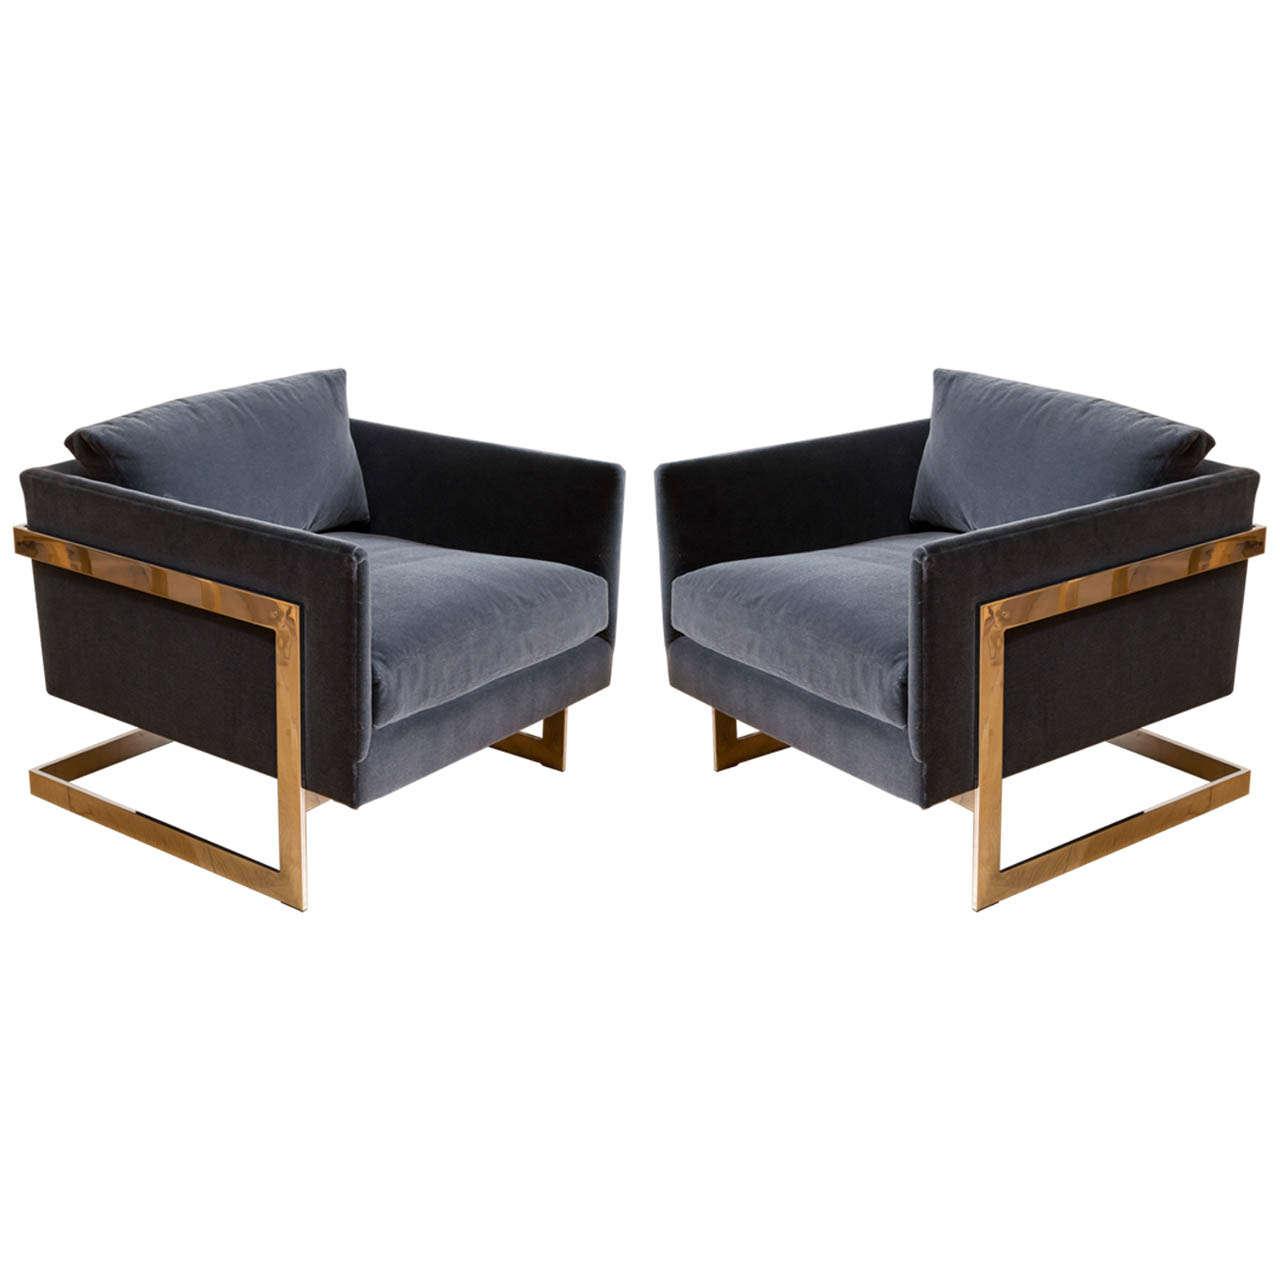 Milo Baughman Lounge Chairs At 1stdibs